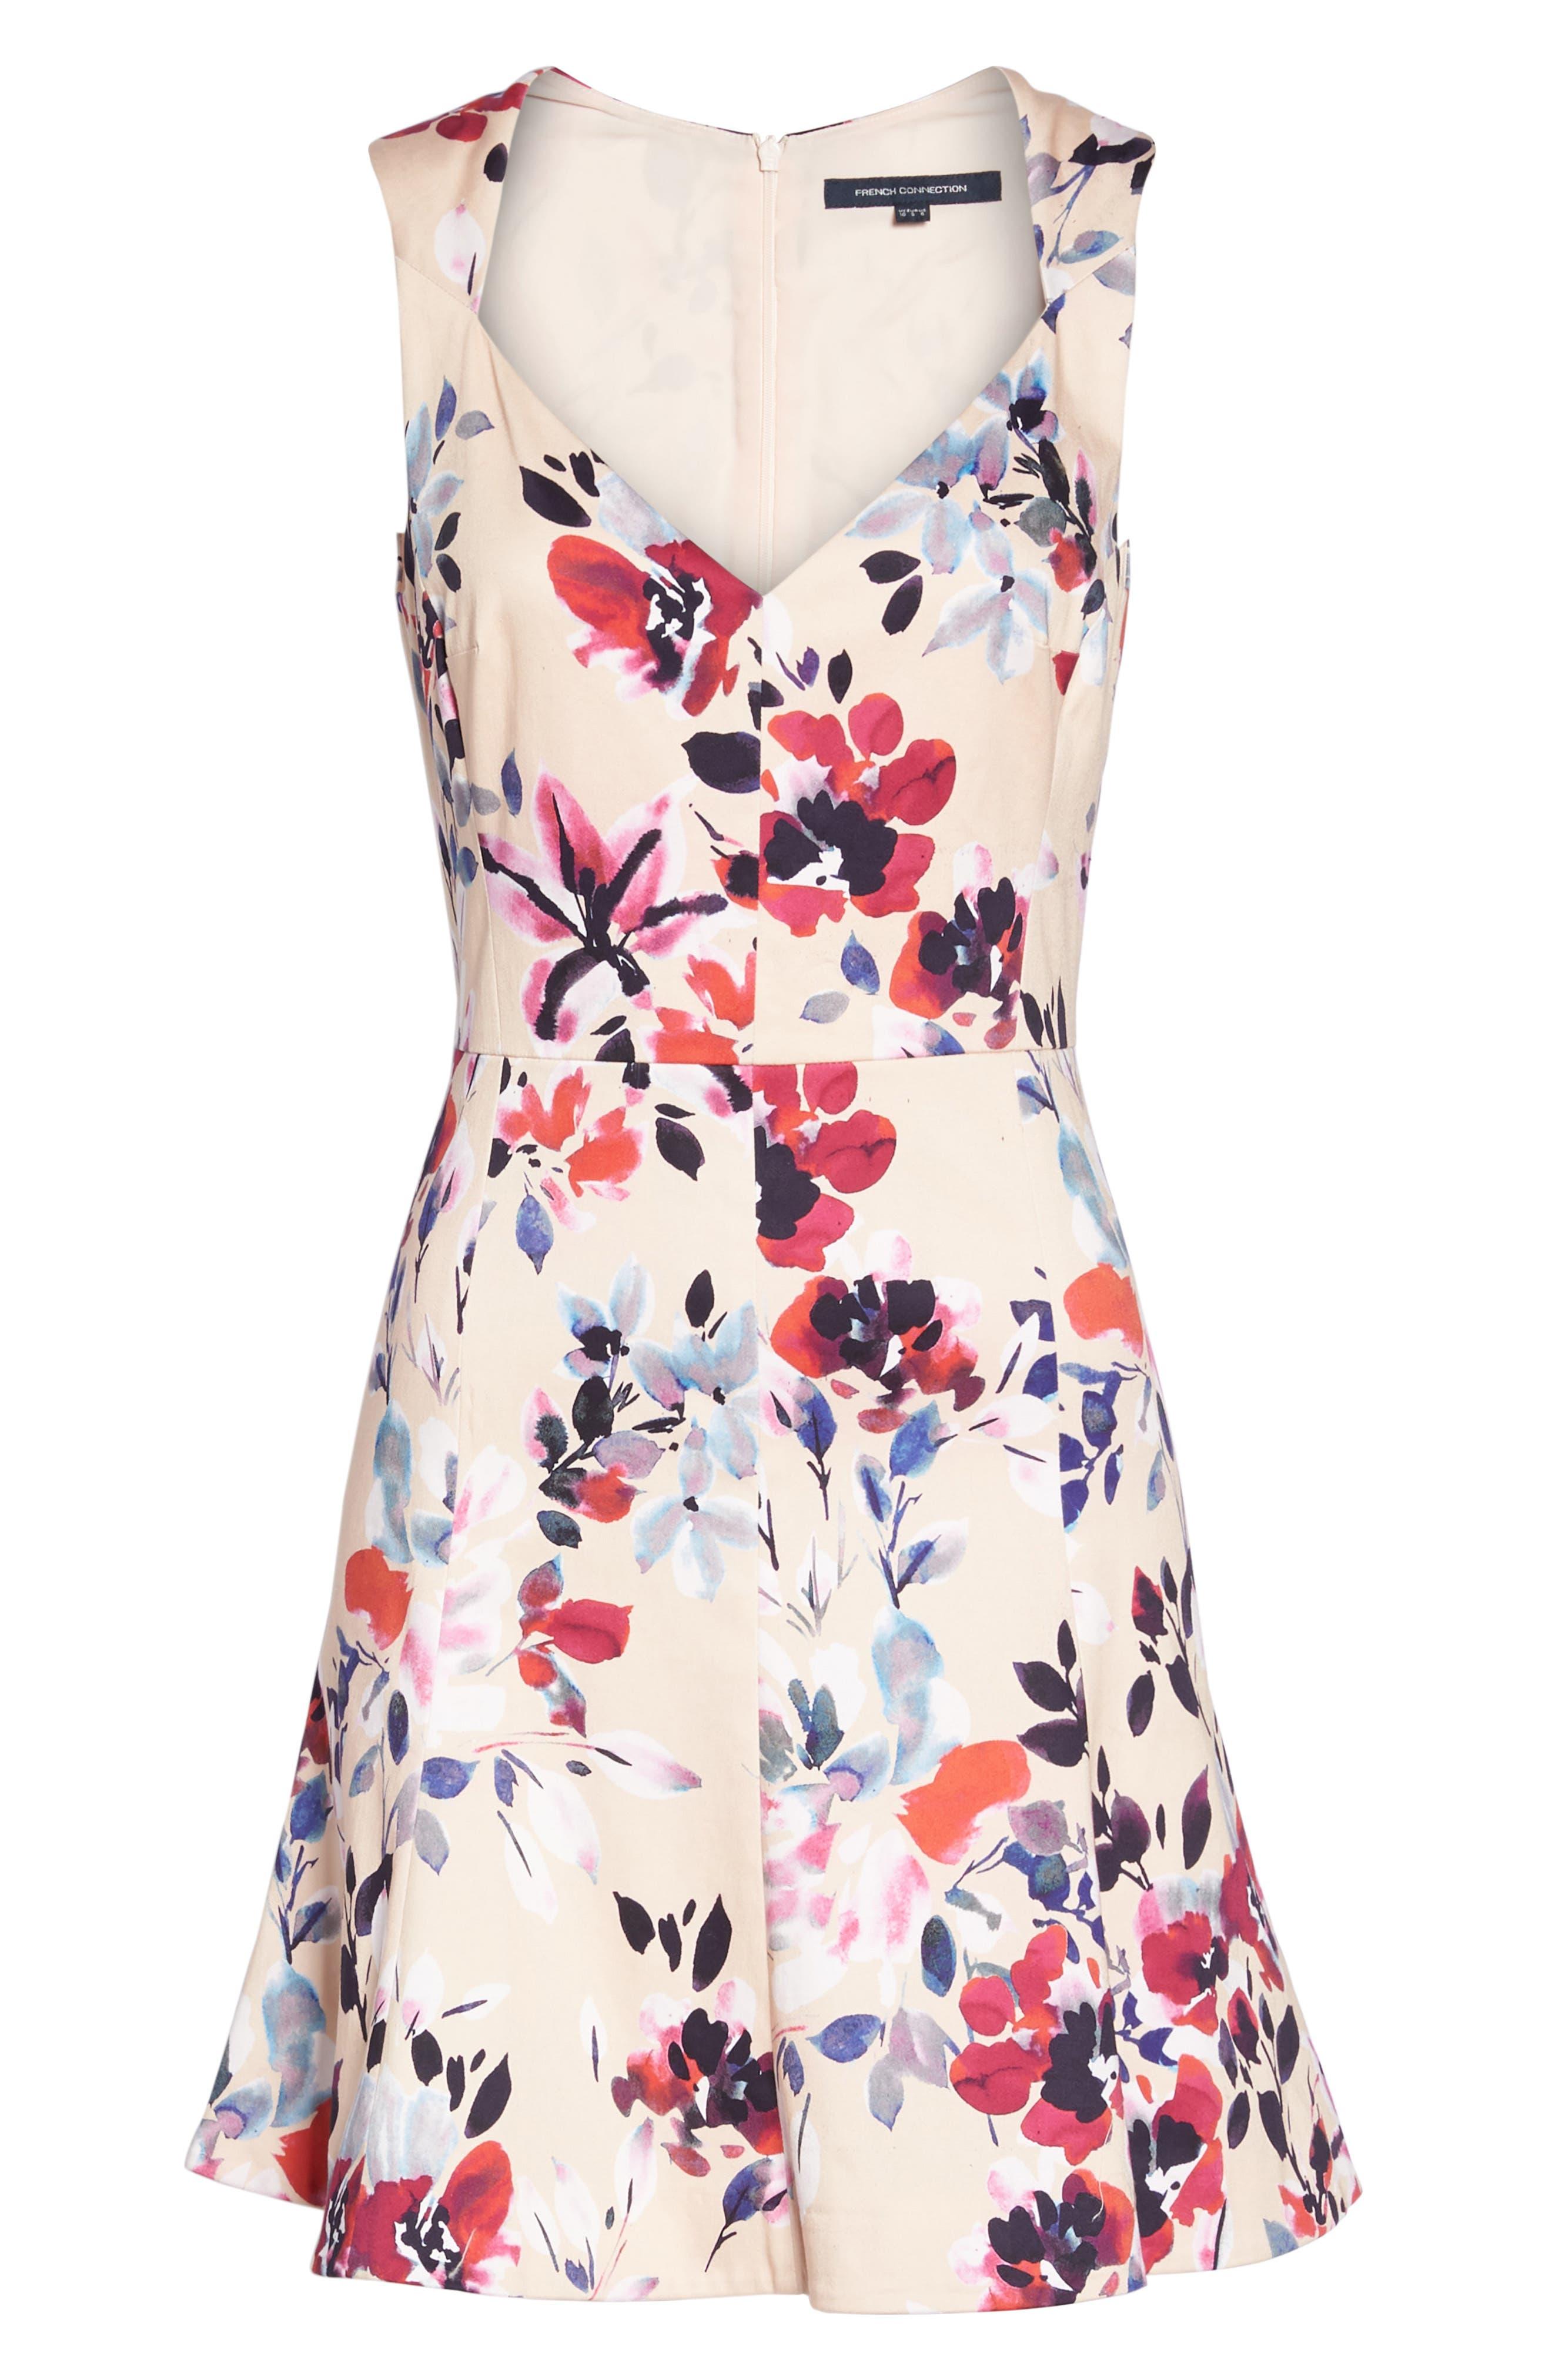 Linosa Fit & Flare Dress,                             Alternate thumbnail 7, color,                             Barley Pink